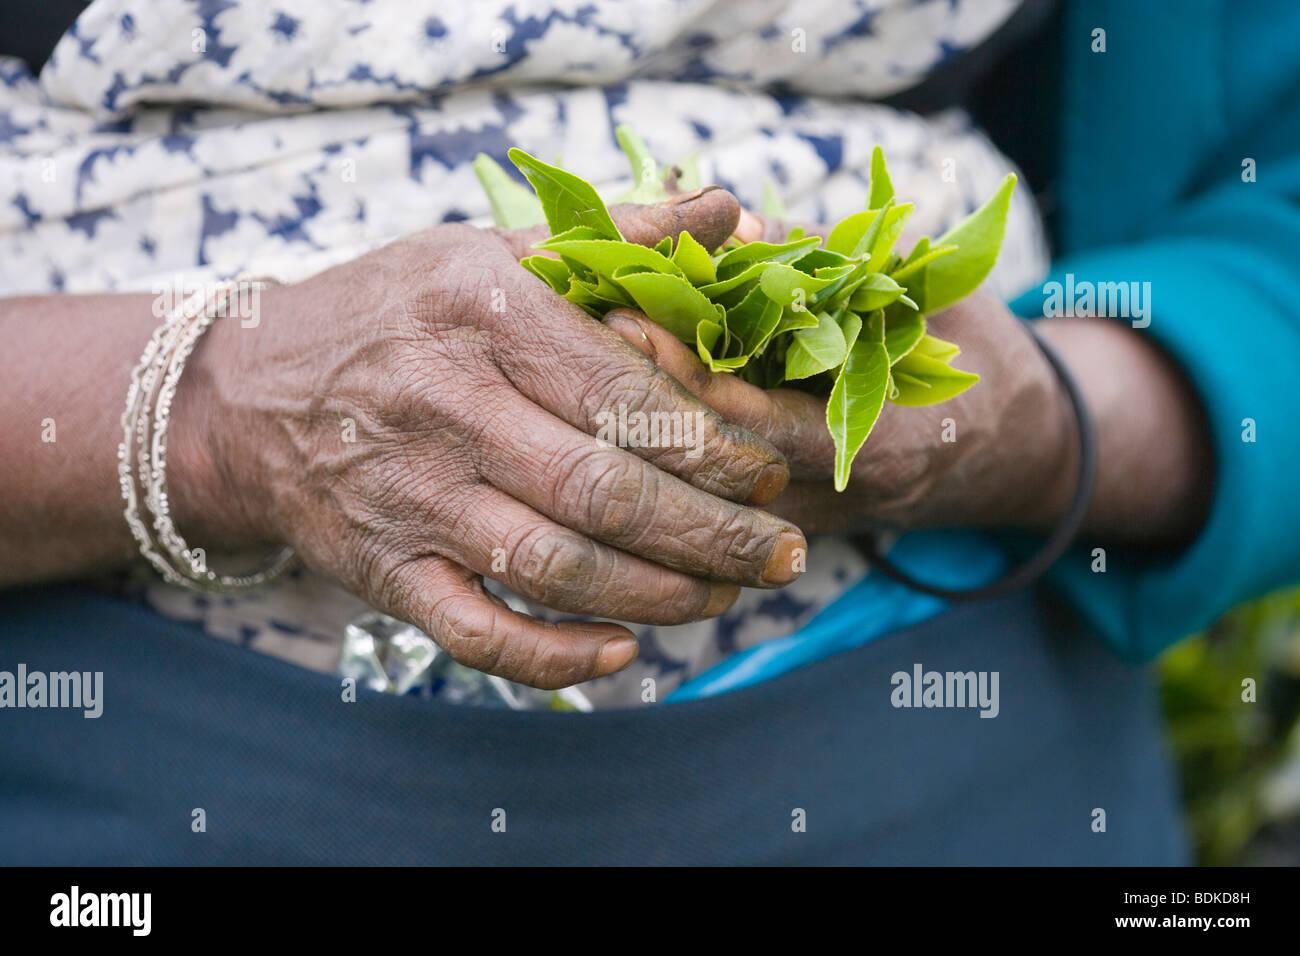 Tamil Tea Picker's hands holding fresh green tea leaf tips, just plucked. Central Highlands. Sri Lanka. Stock Photo